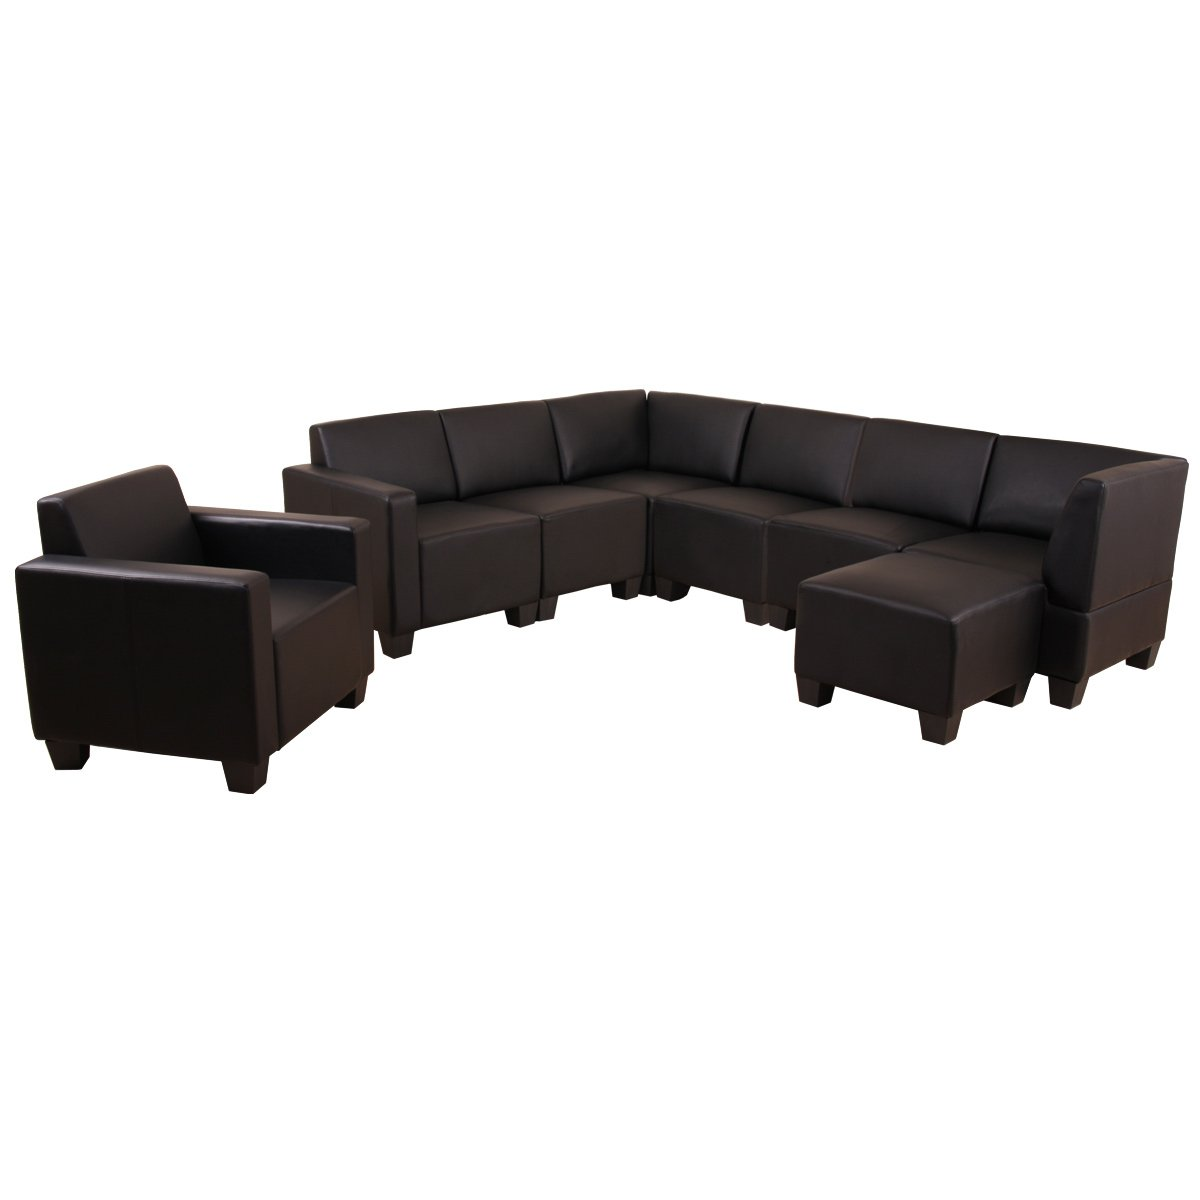 Modular Sofa-System Couch-Garnitur Lyon 6-1-1, Kunstleder ~ schwarz